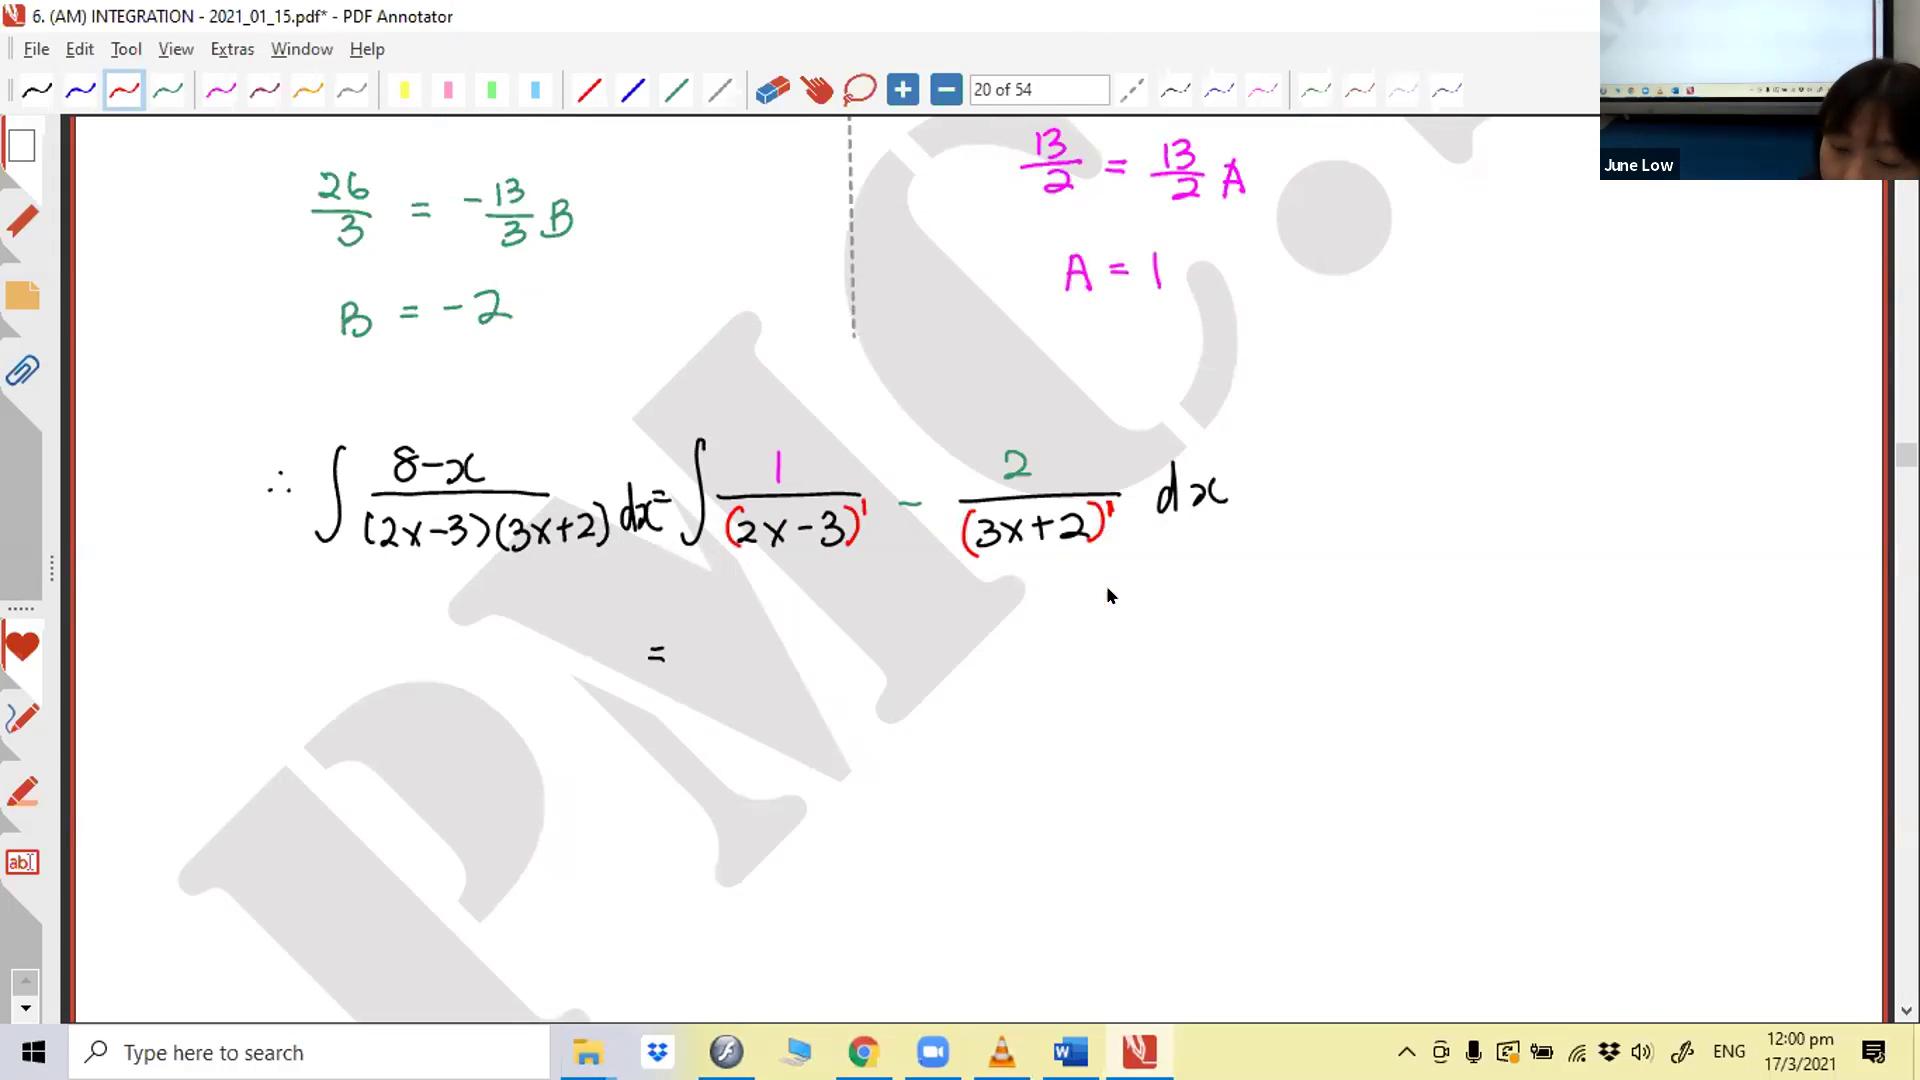 [INTEGRATION] Algebraic Fractions